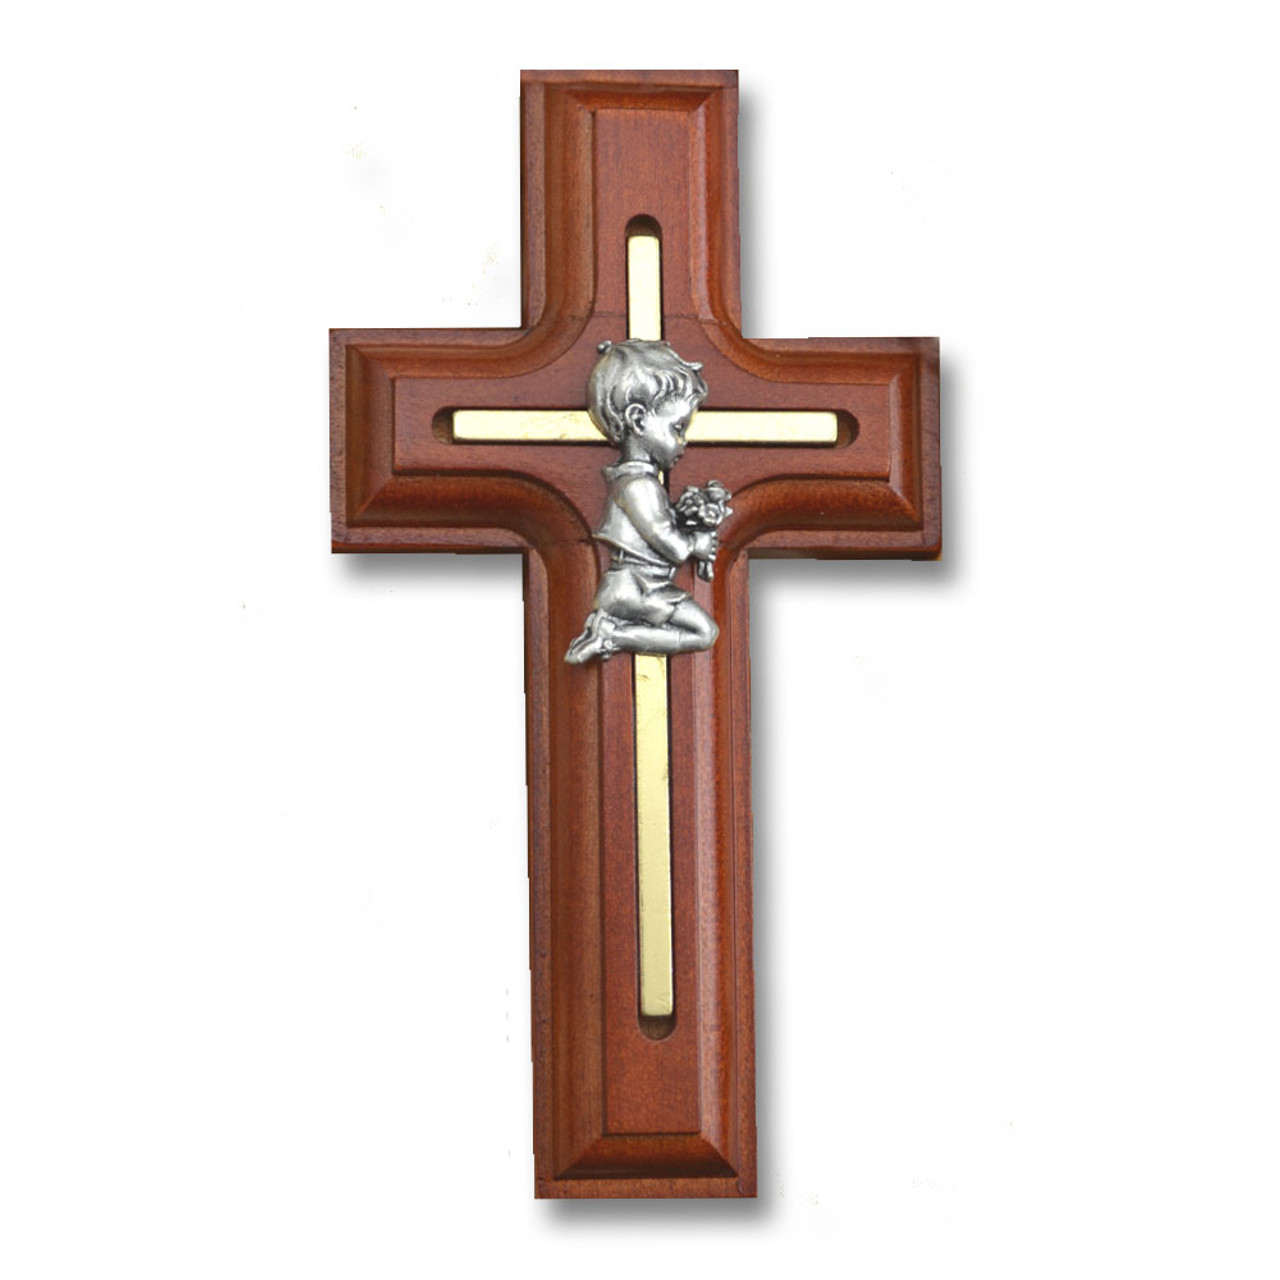 Rosewood Praying Boy Inlay Cross 5IN